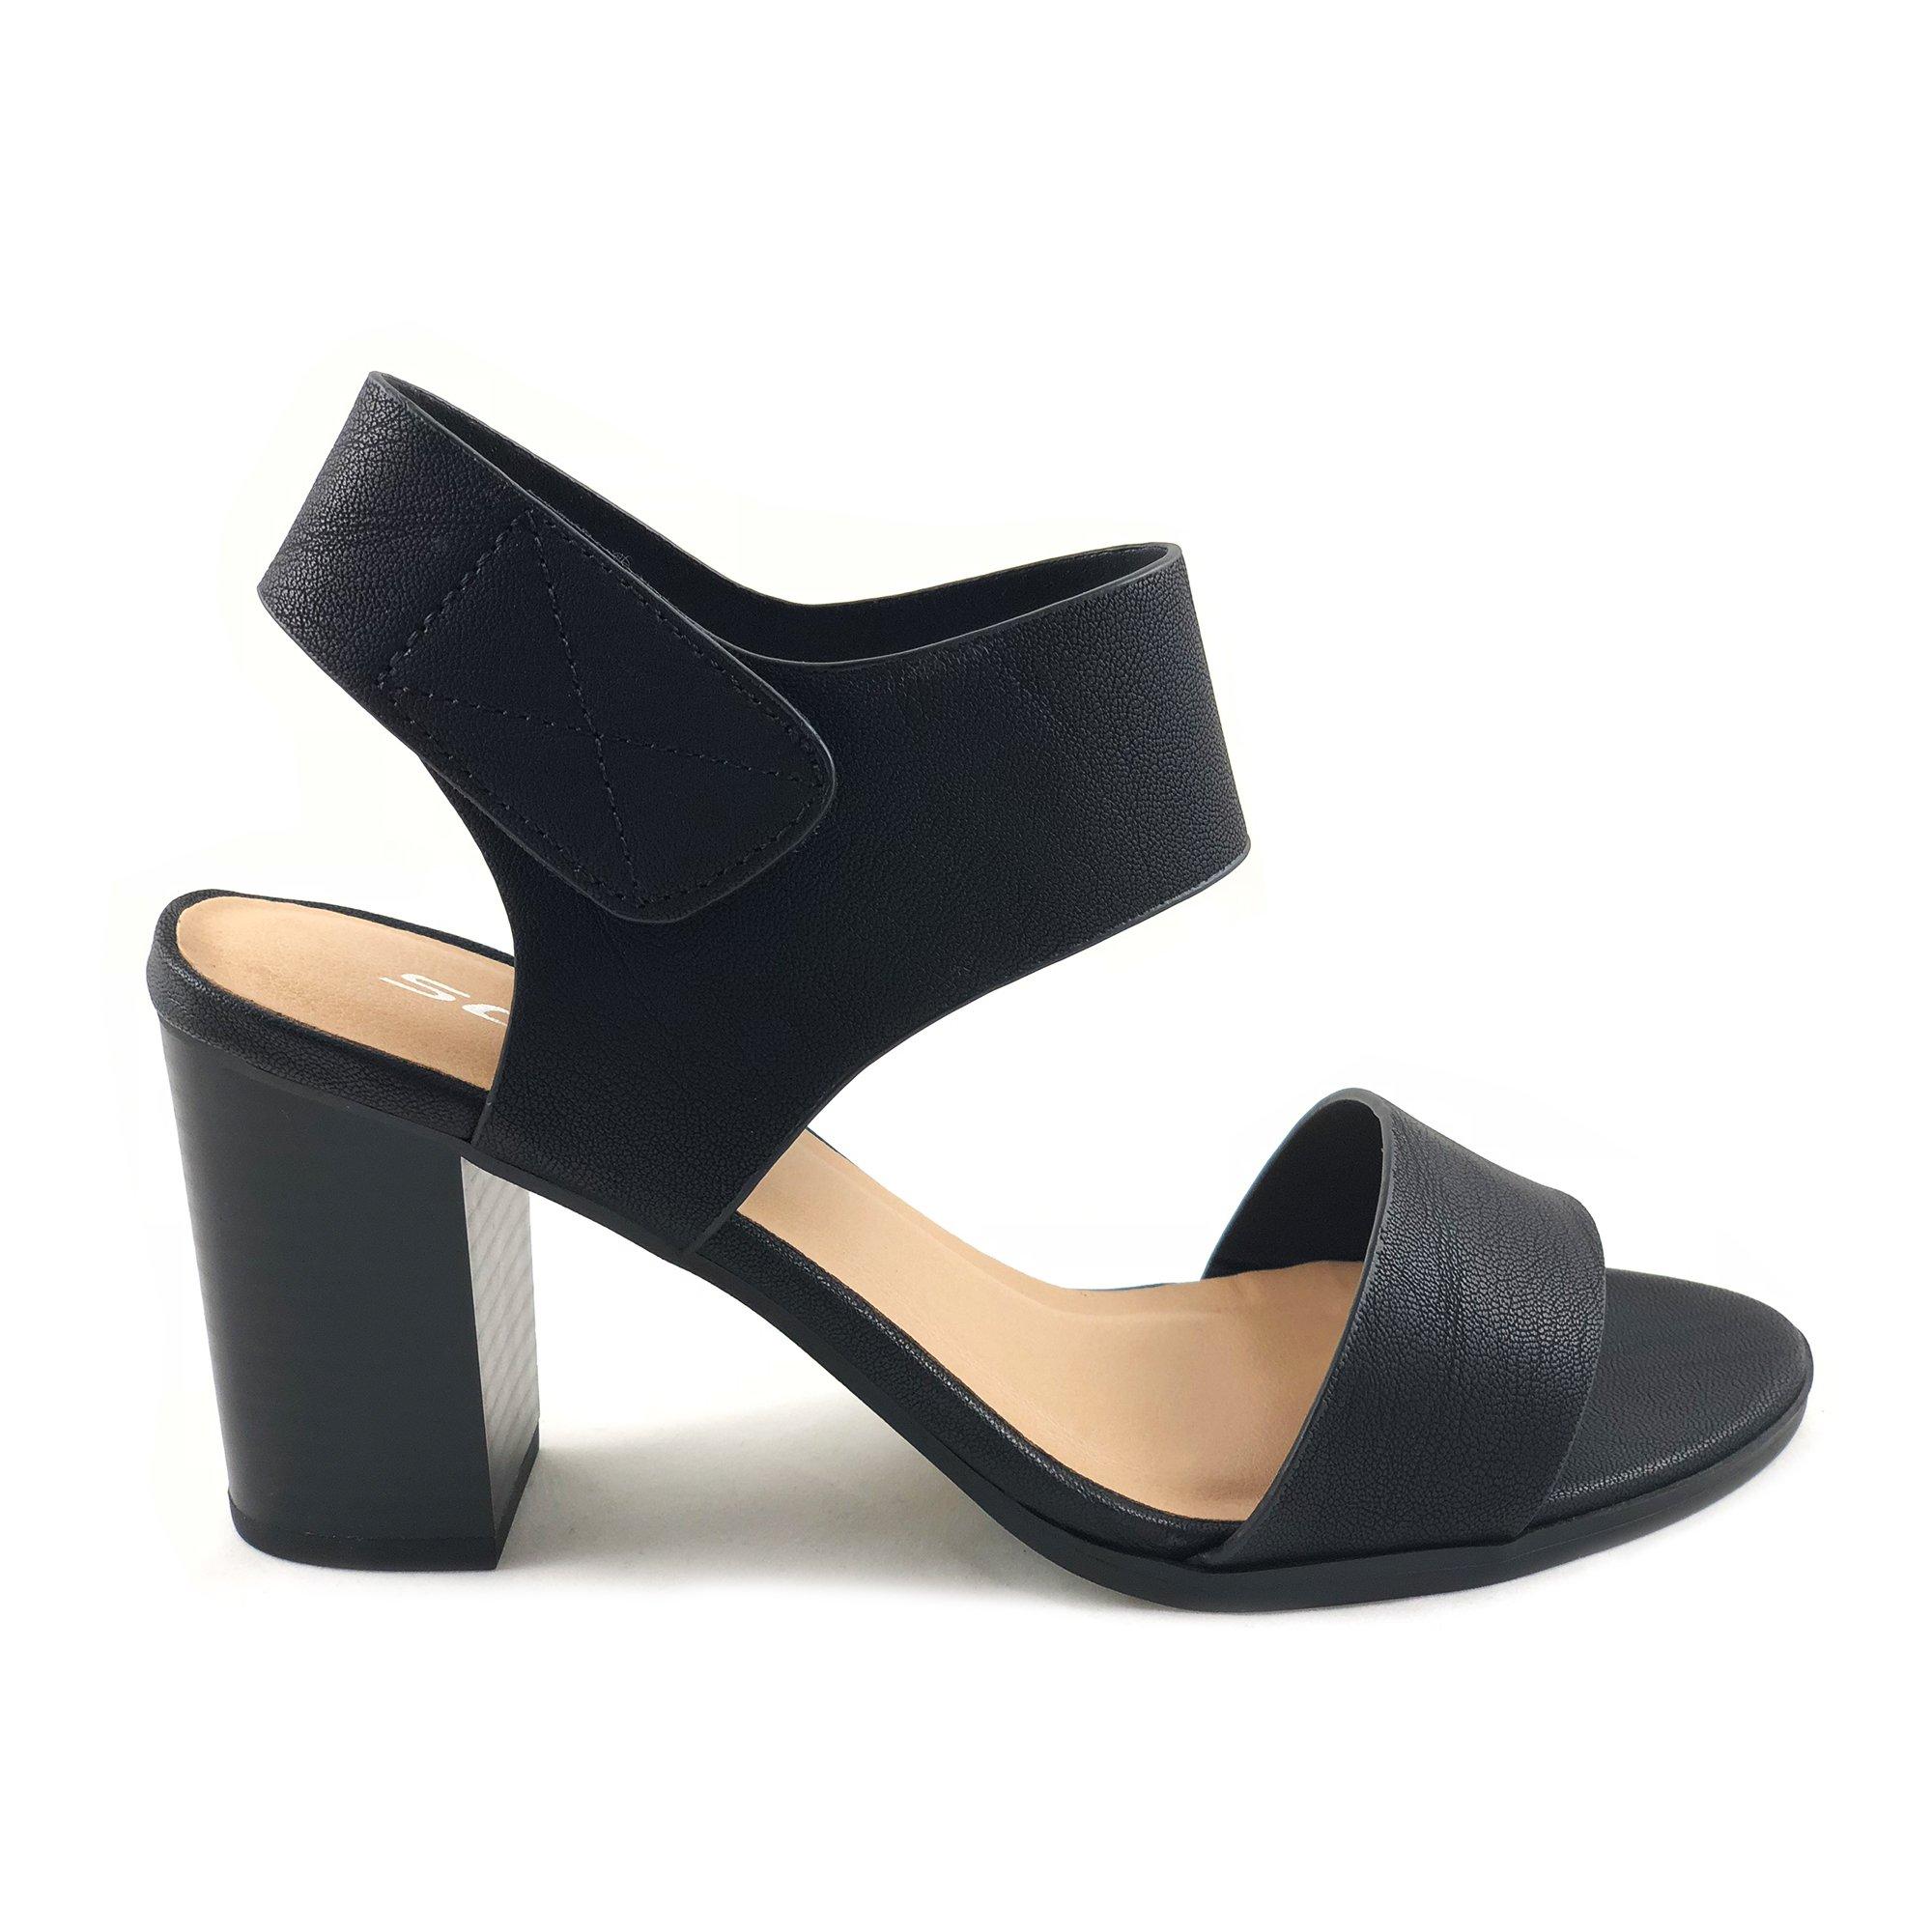 Soda Topshoeave Wait Womens Open Toe Chunky Heel Ankle Strap Shoes Block High Heel Dress Sandals (6.5 B(M) US, Black NBPU)